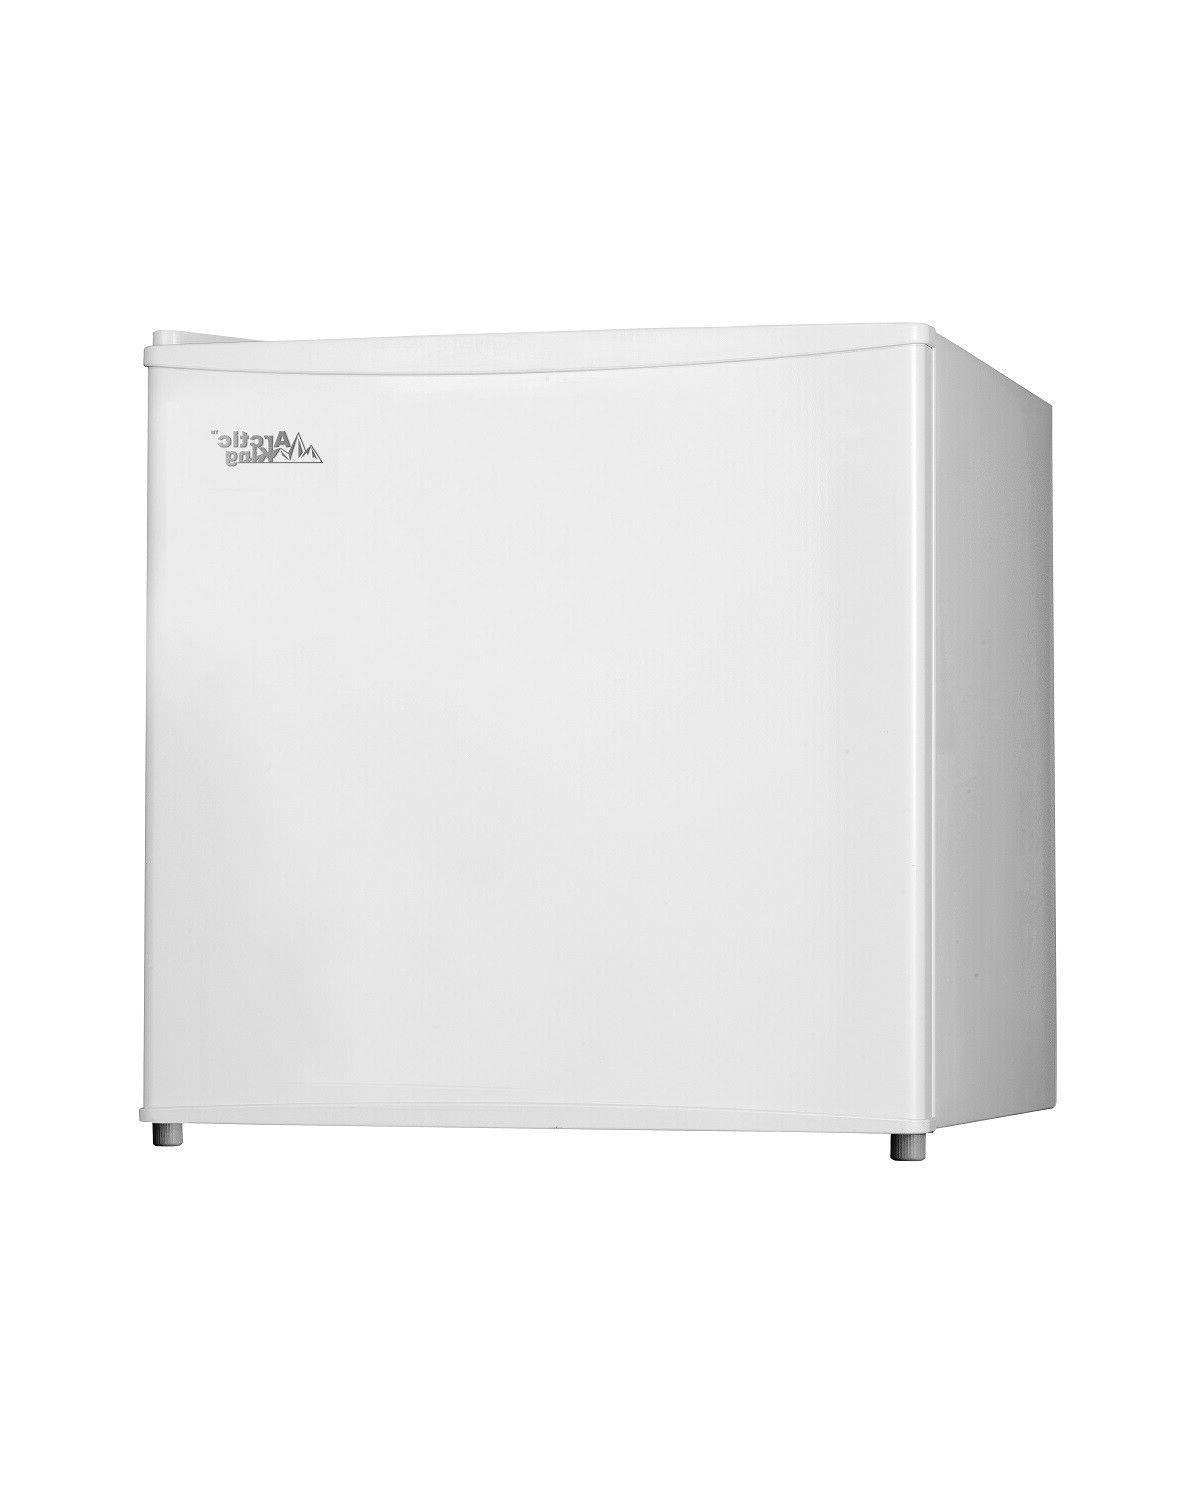 1.1 ft Upright Freezer Space White